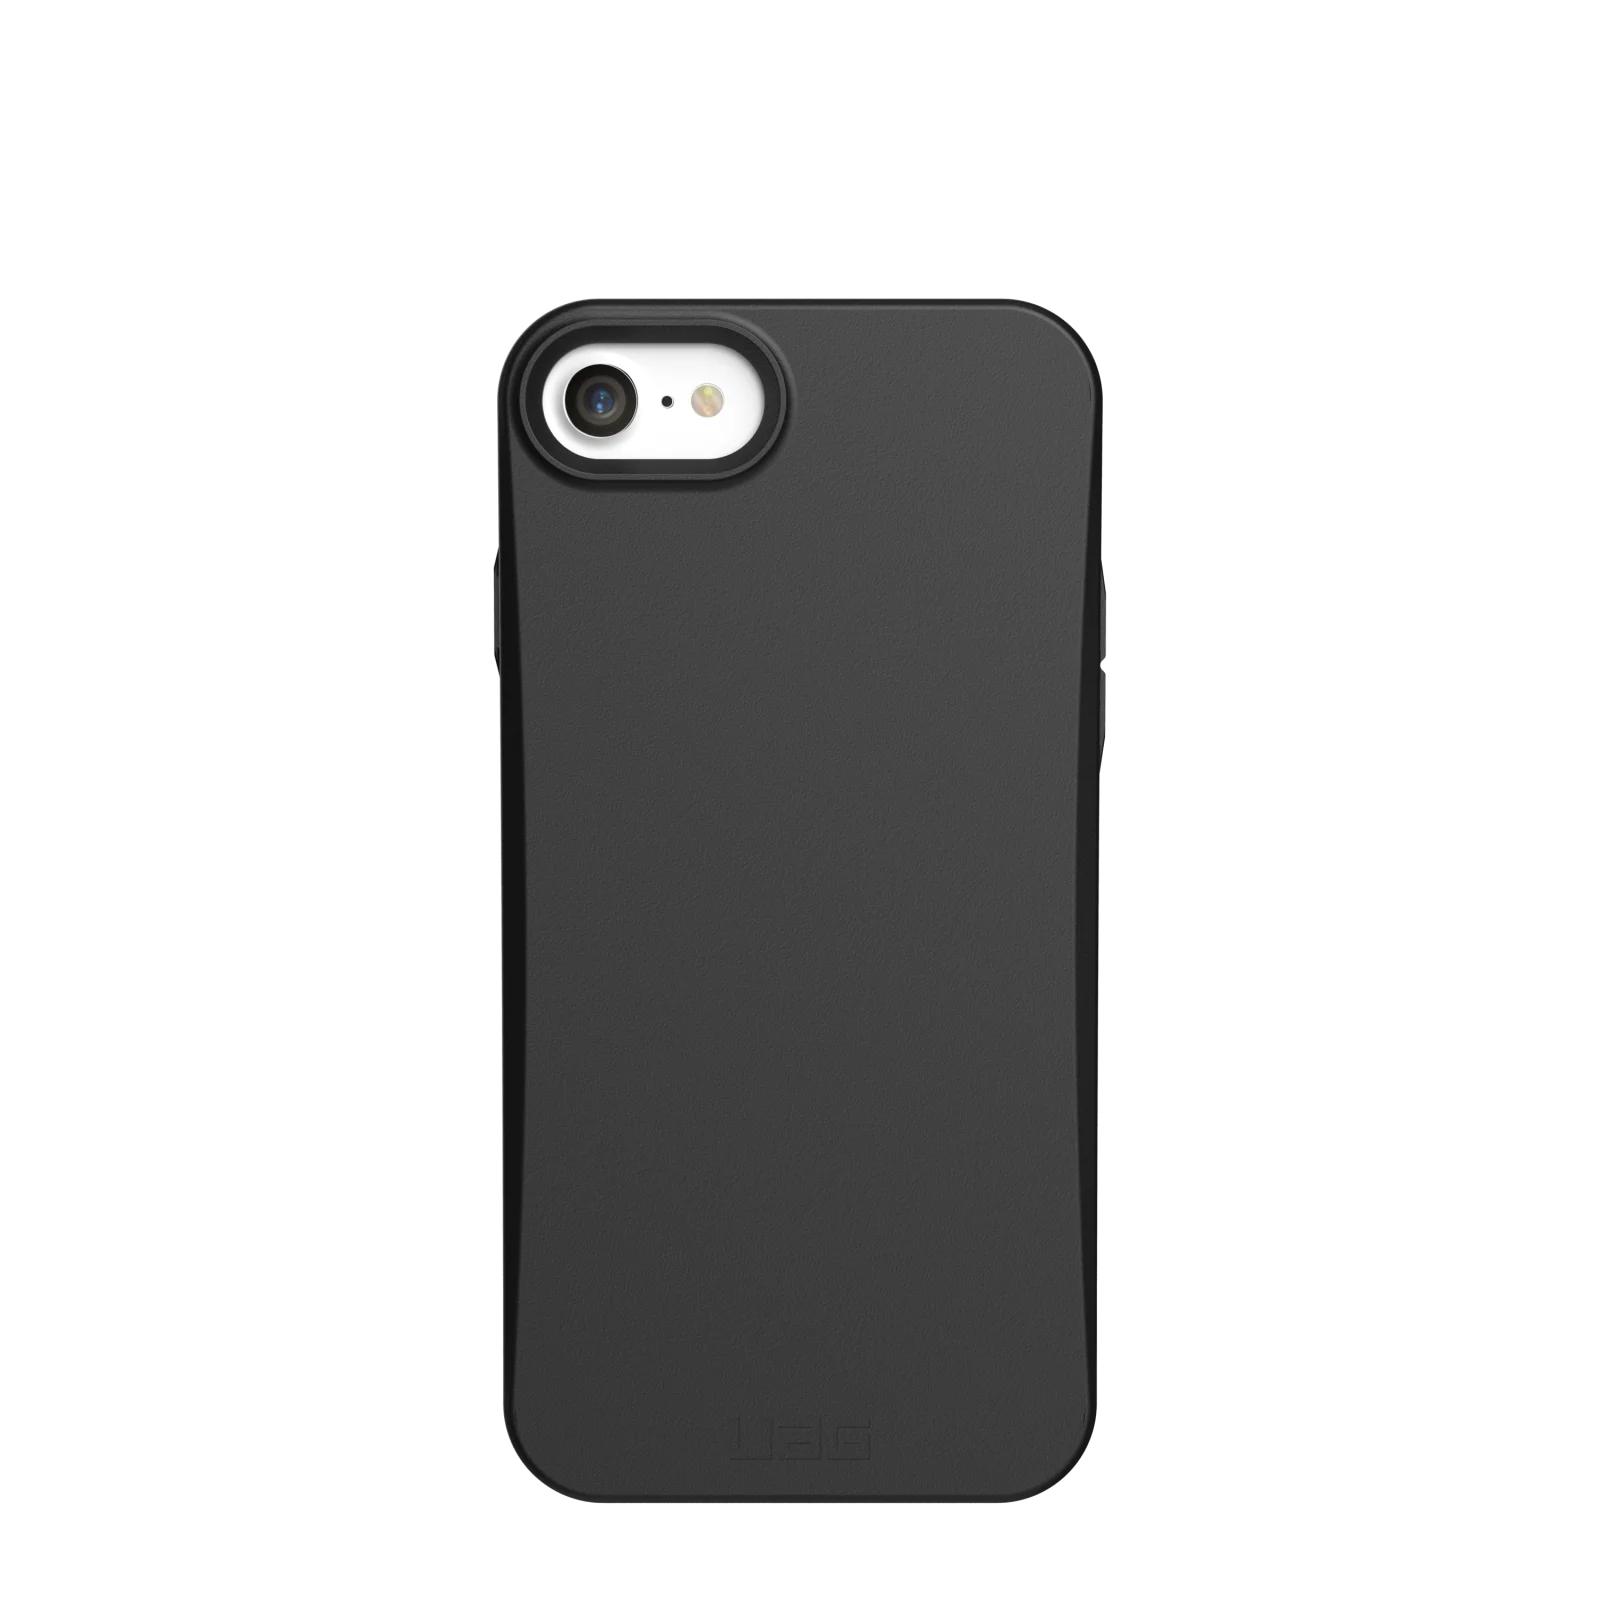 "Urban Armor Gear Biodegradable Outback funda para teléfono móvil 11,9 cm (4.7"") Carcasa rígida Negro"